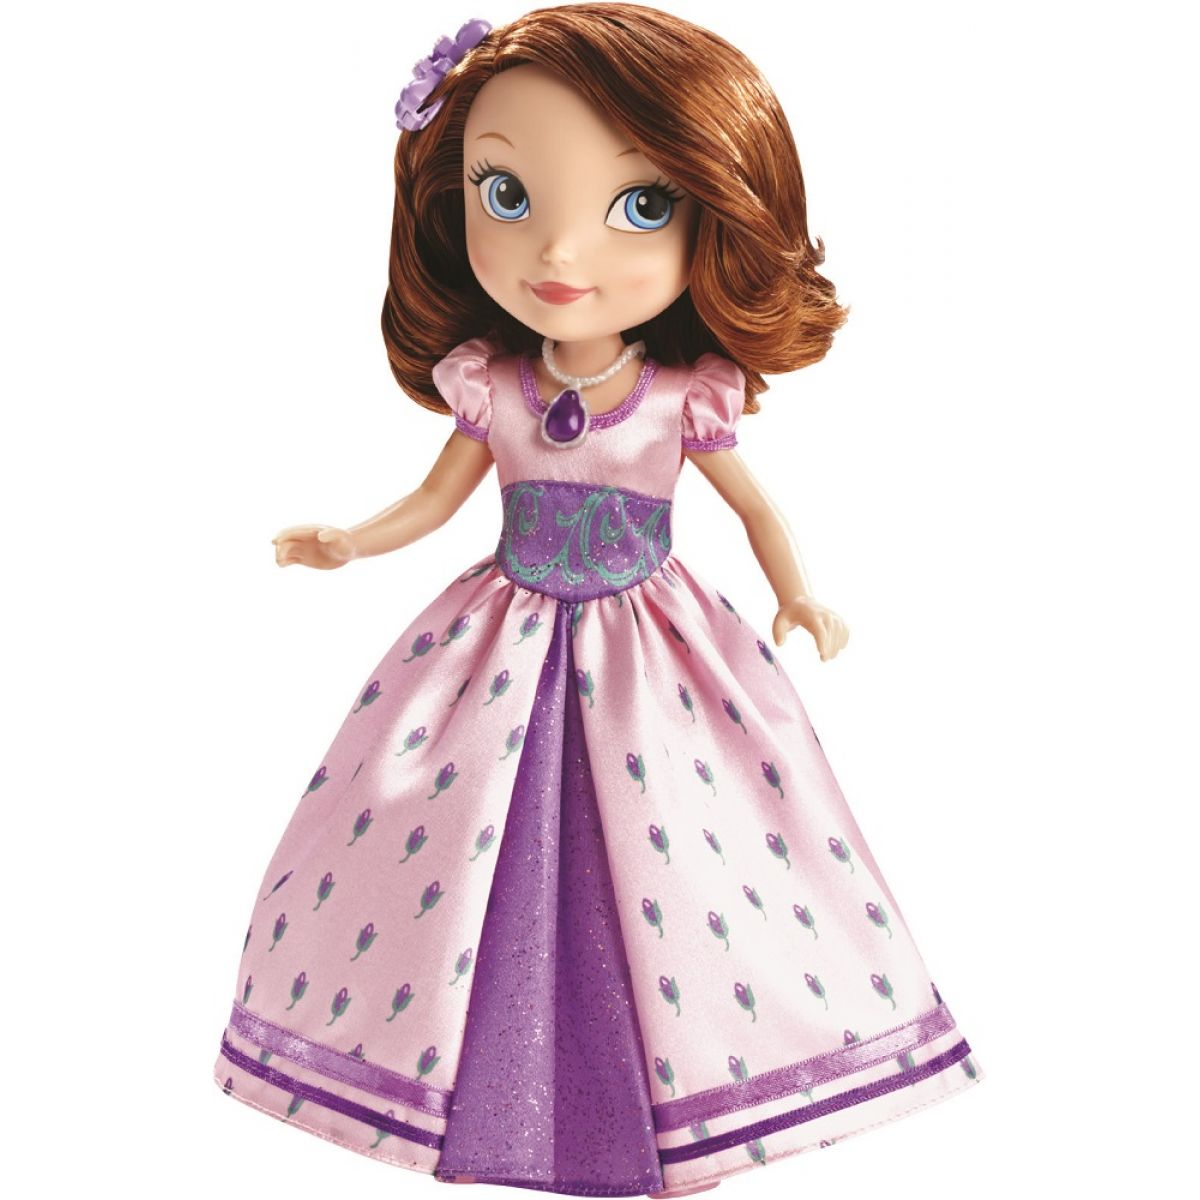 Sofie denní šaty 25cm (MATTEL BDH66)